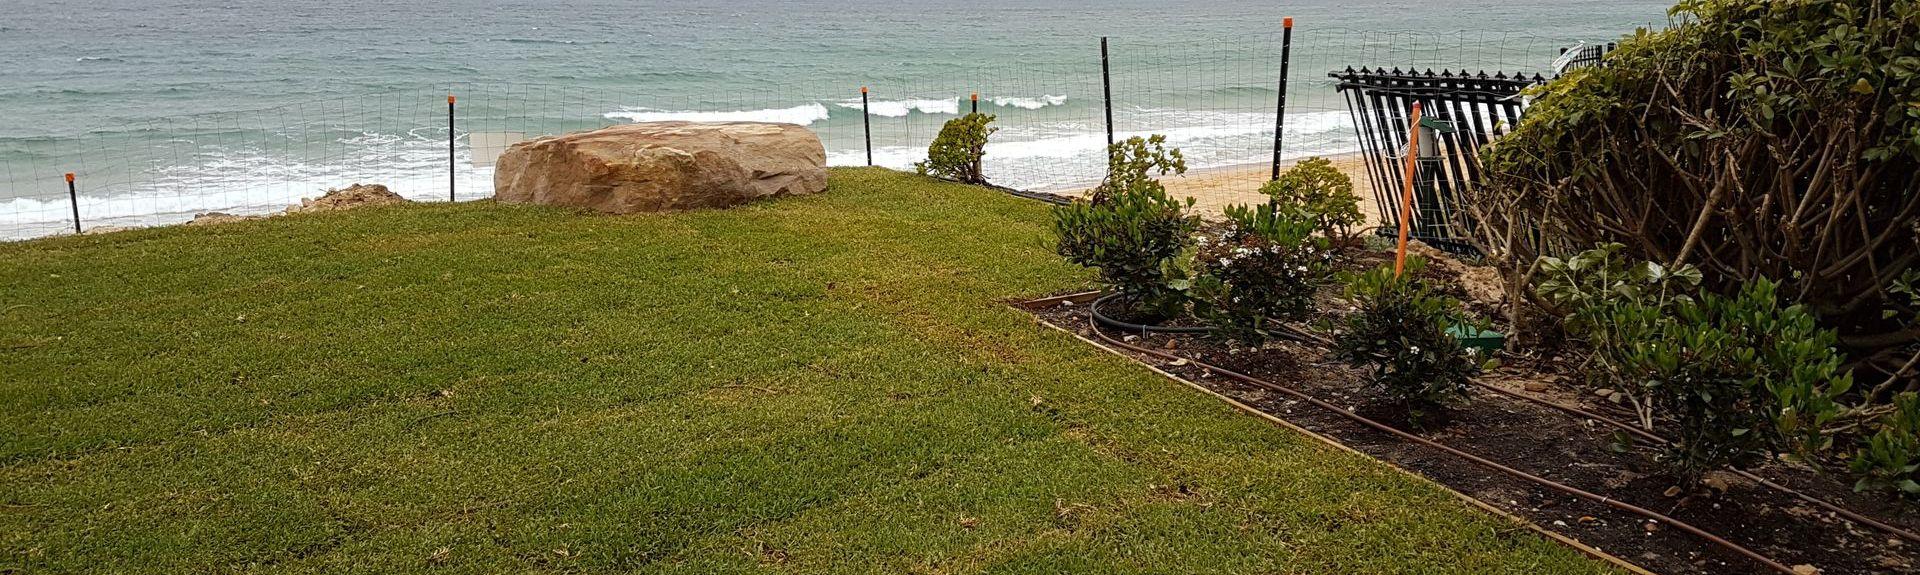 Collaroy Beach, Collaroy, NSW, Australia